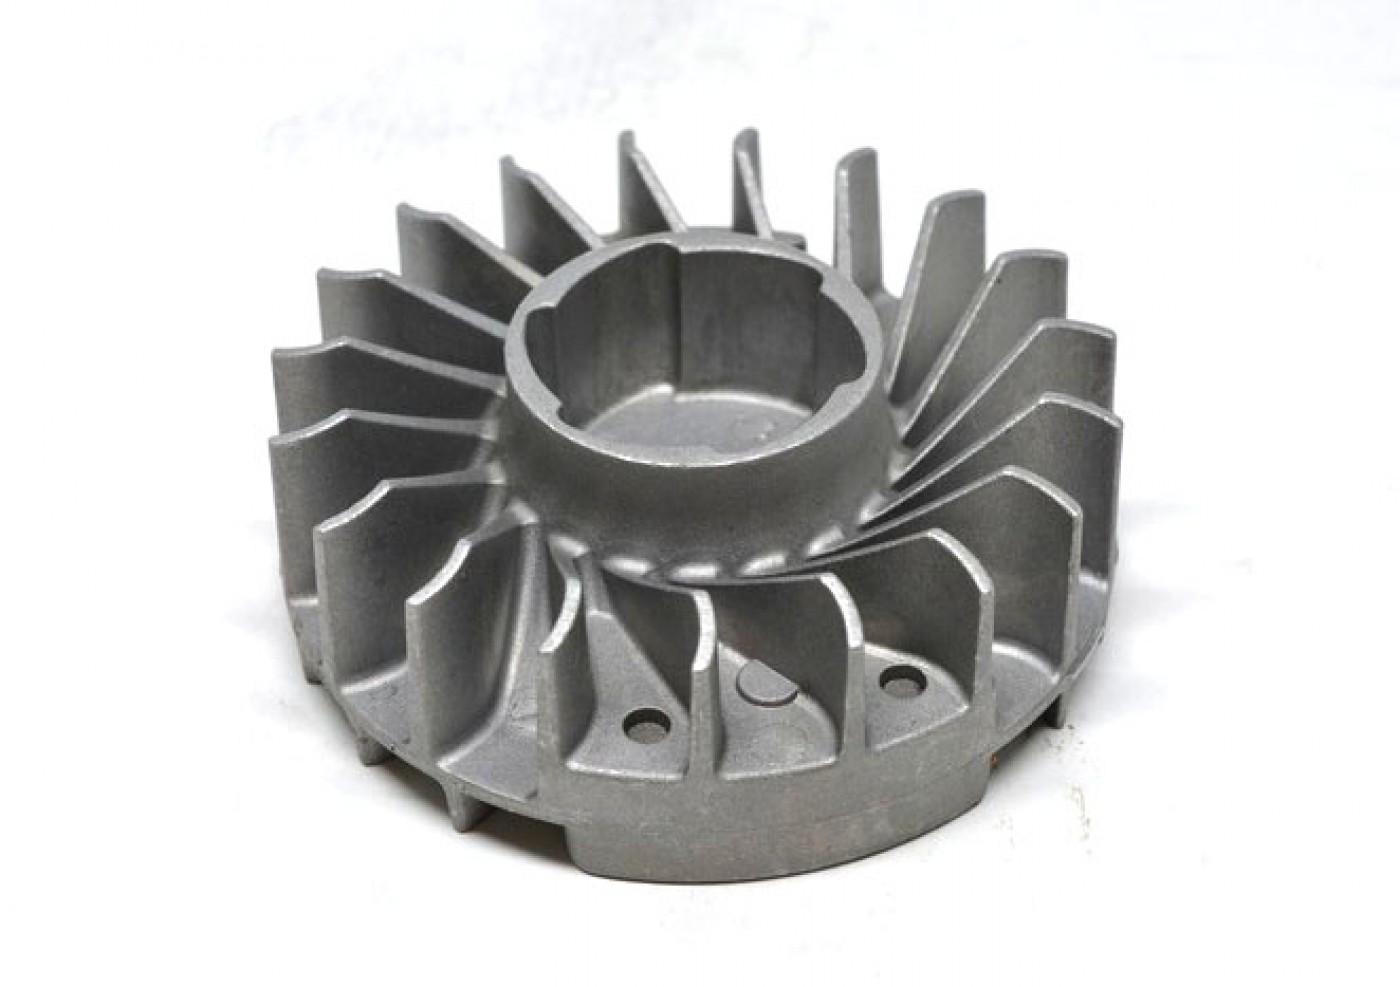 Ventilátor Stihl FS120 BT120C FS200 FS250 HT250 FS300 FS350 FR450 FR480 (4134 400 1200)